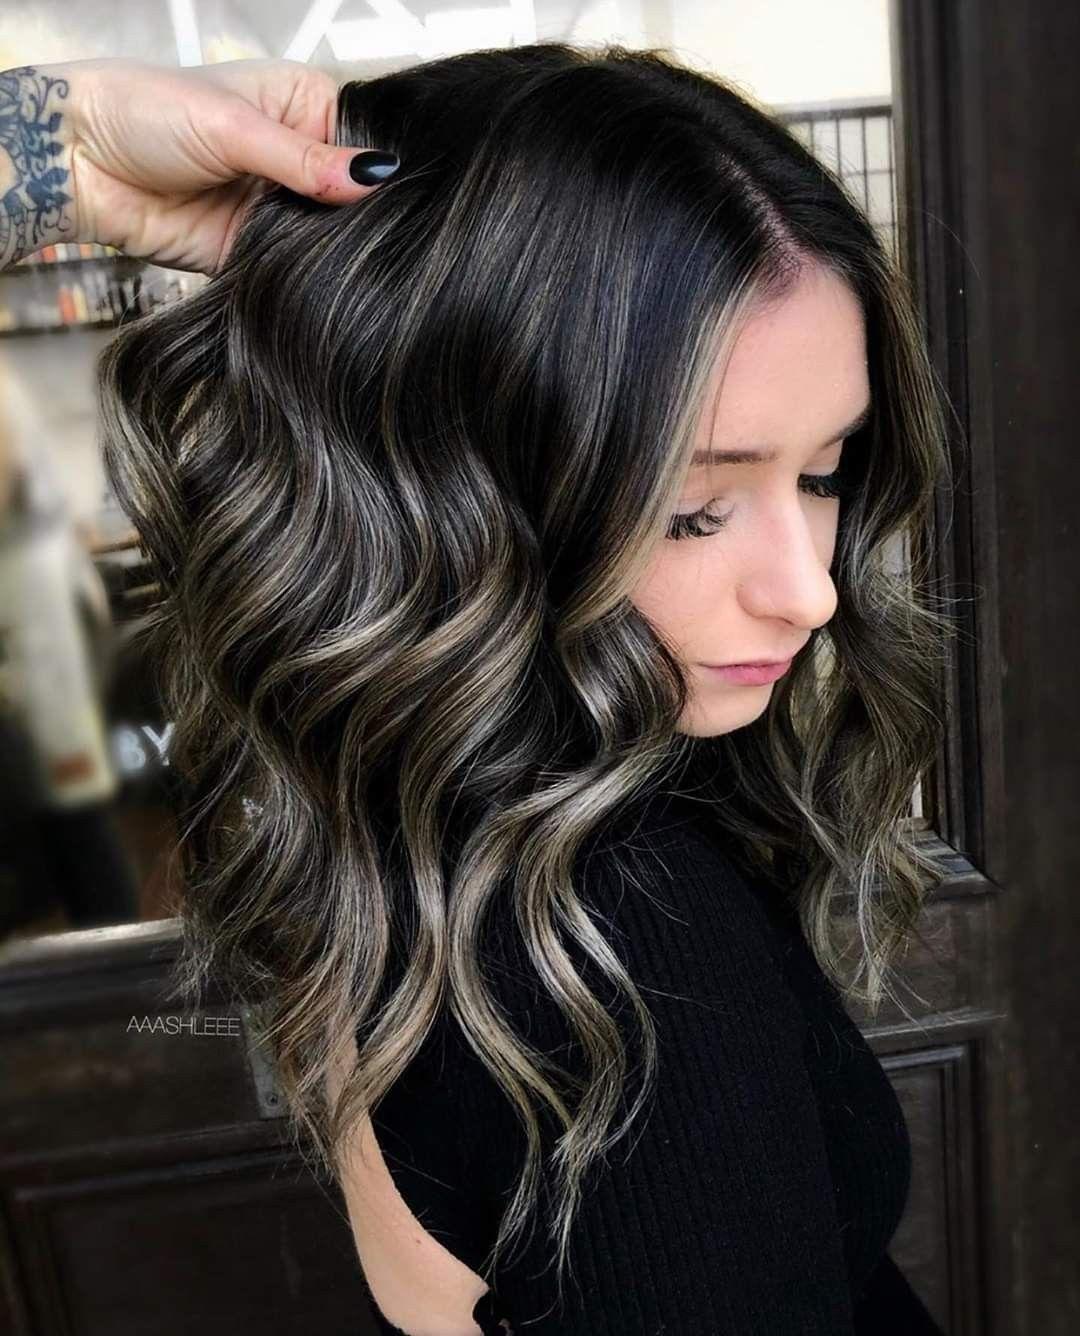 Pin by Tamara Kopčokova on Frizuri in 2020 | Long hair ...